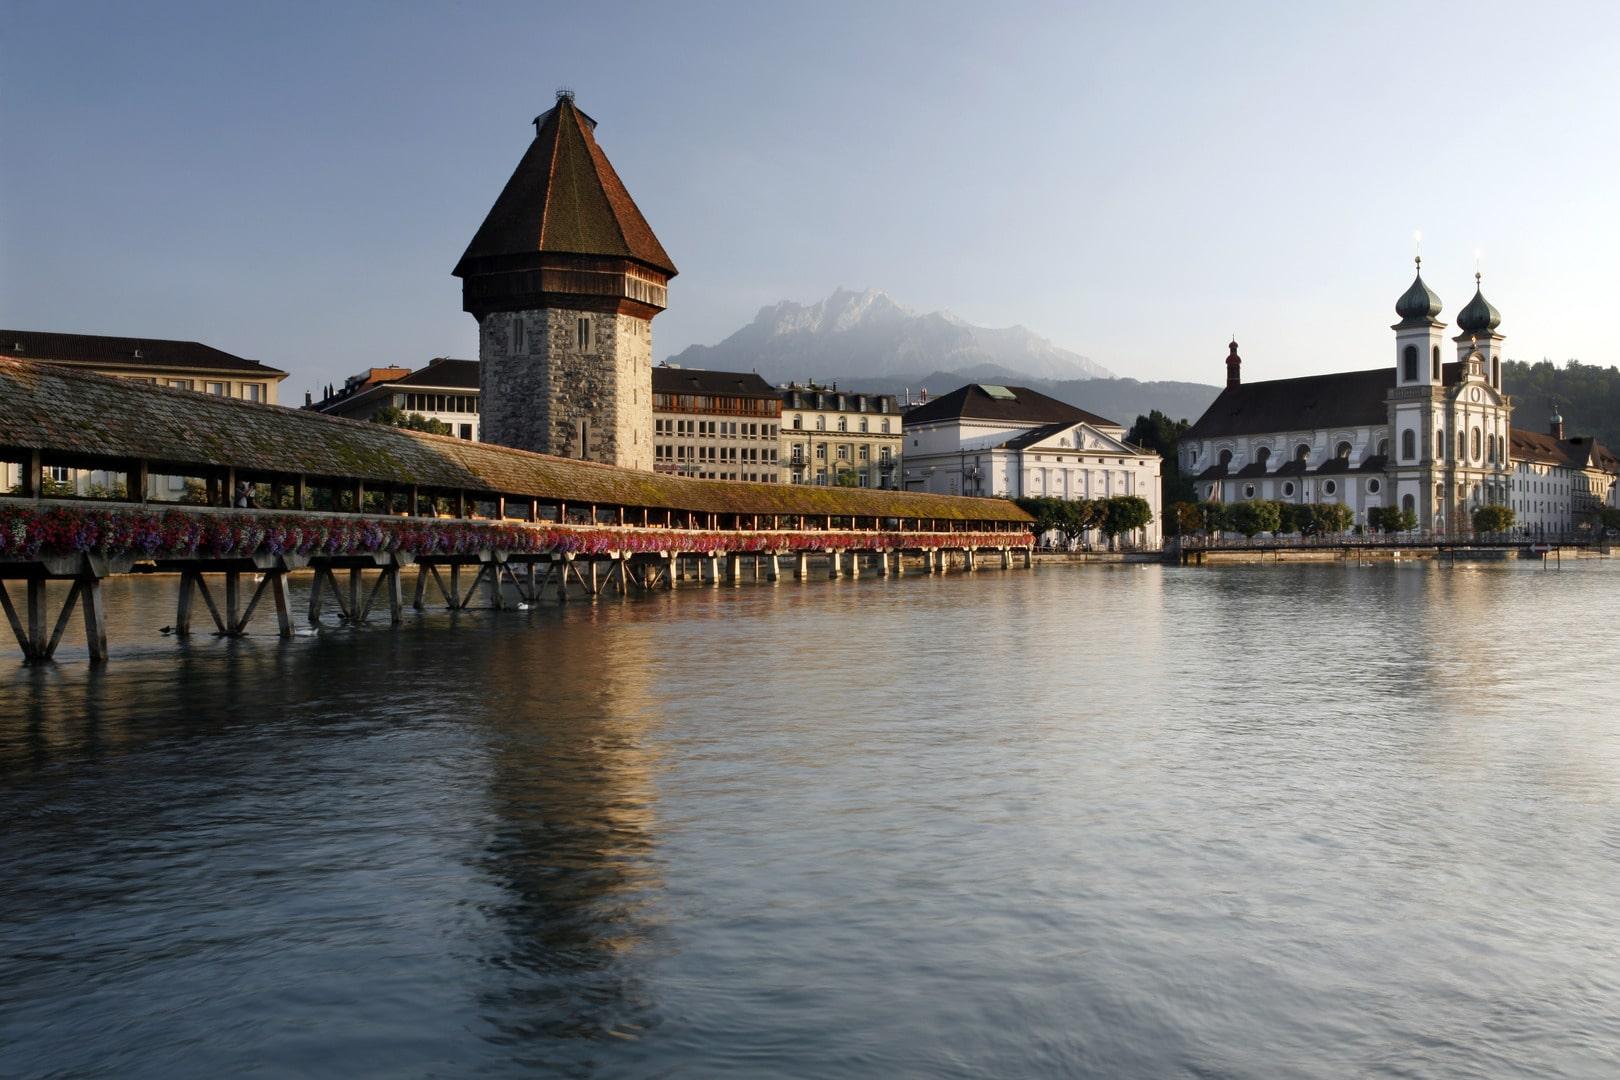 Luzern, August 2012, KapellbrŸcke, Wasserturm, Rathausquai